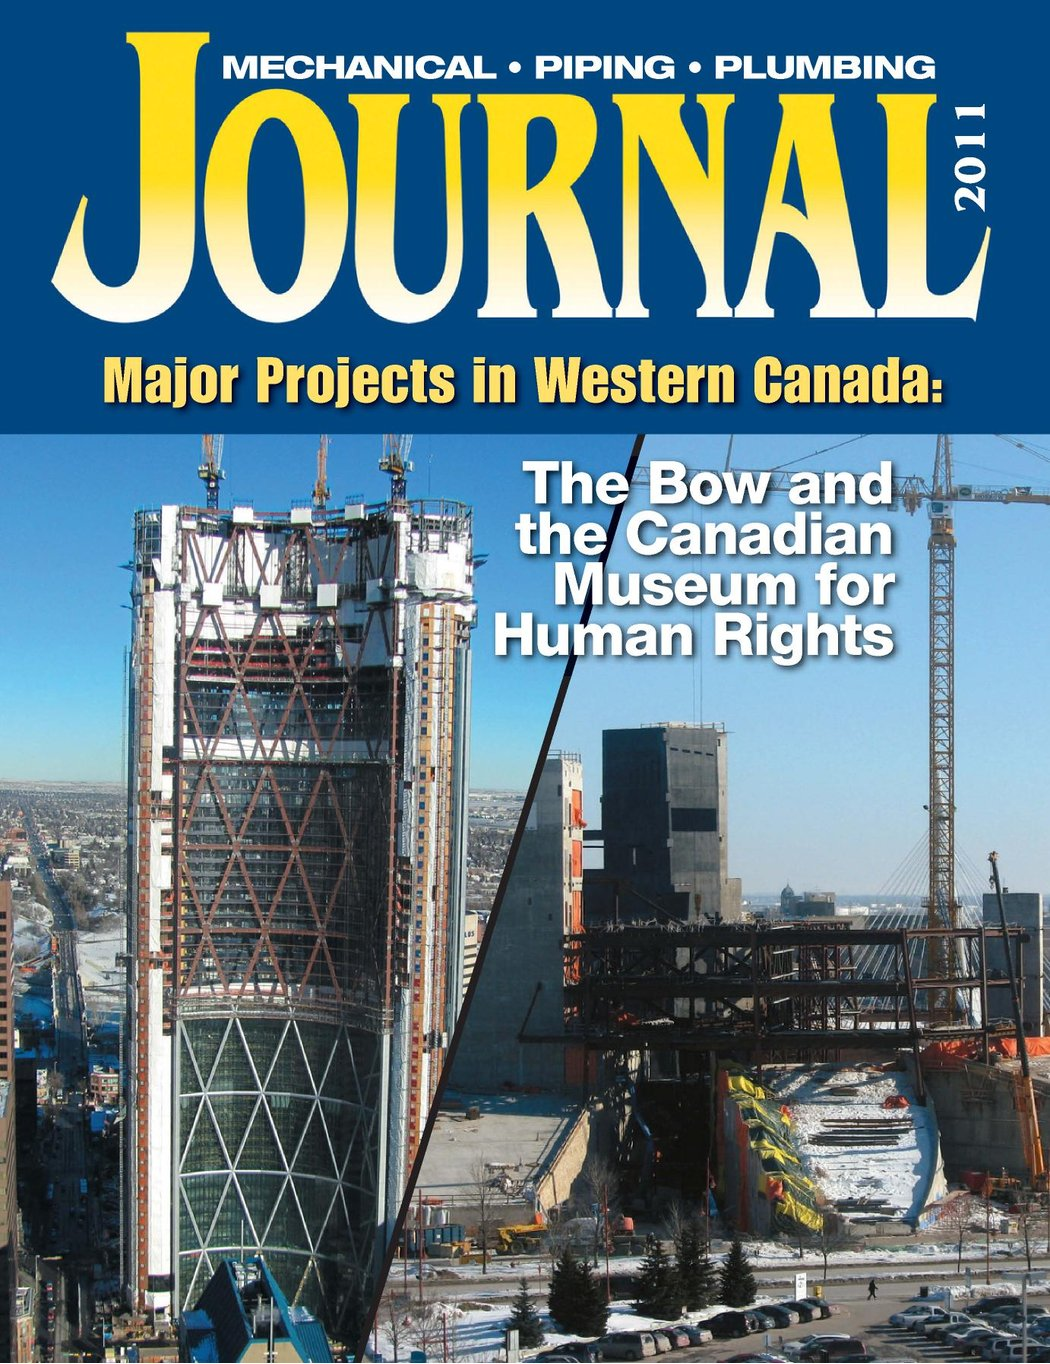 Mechanical Piping Plumbing Journal 2011